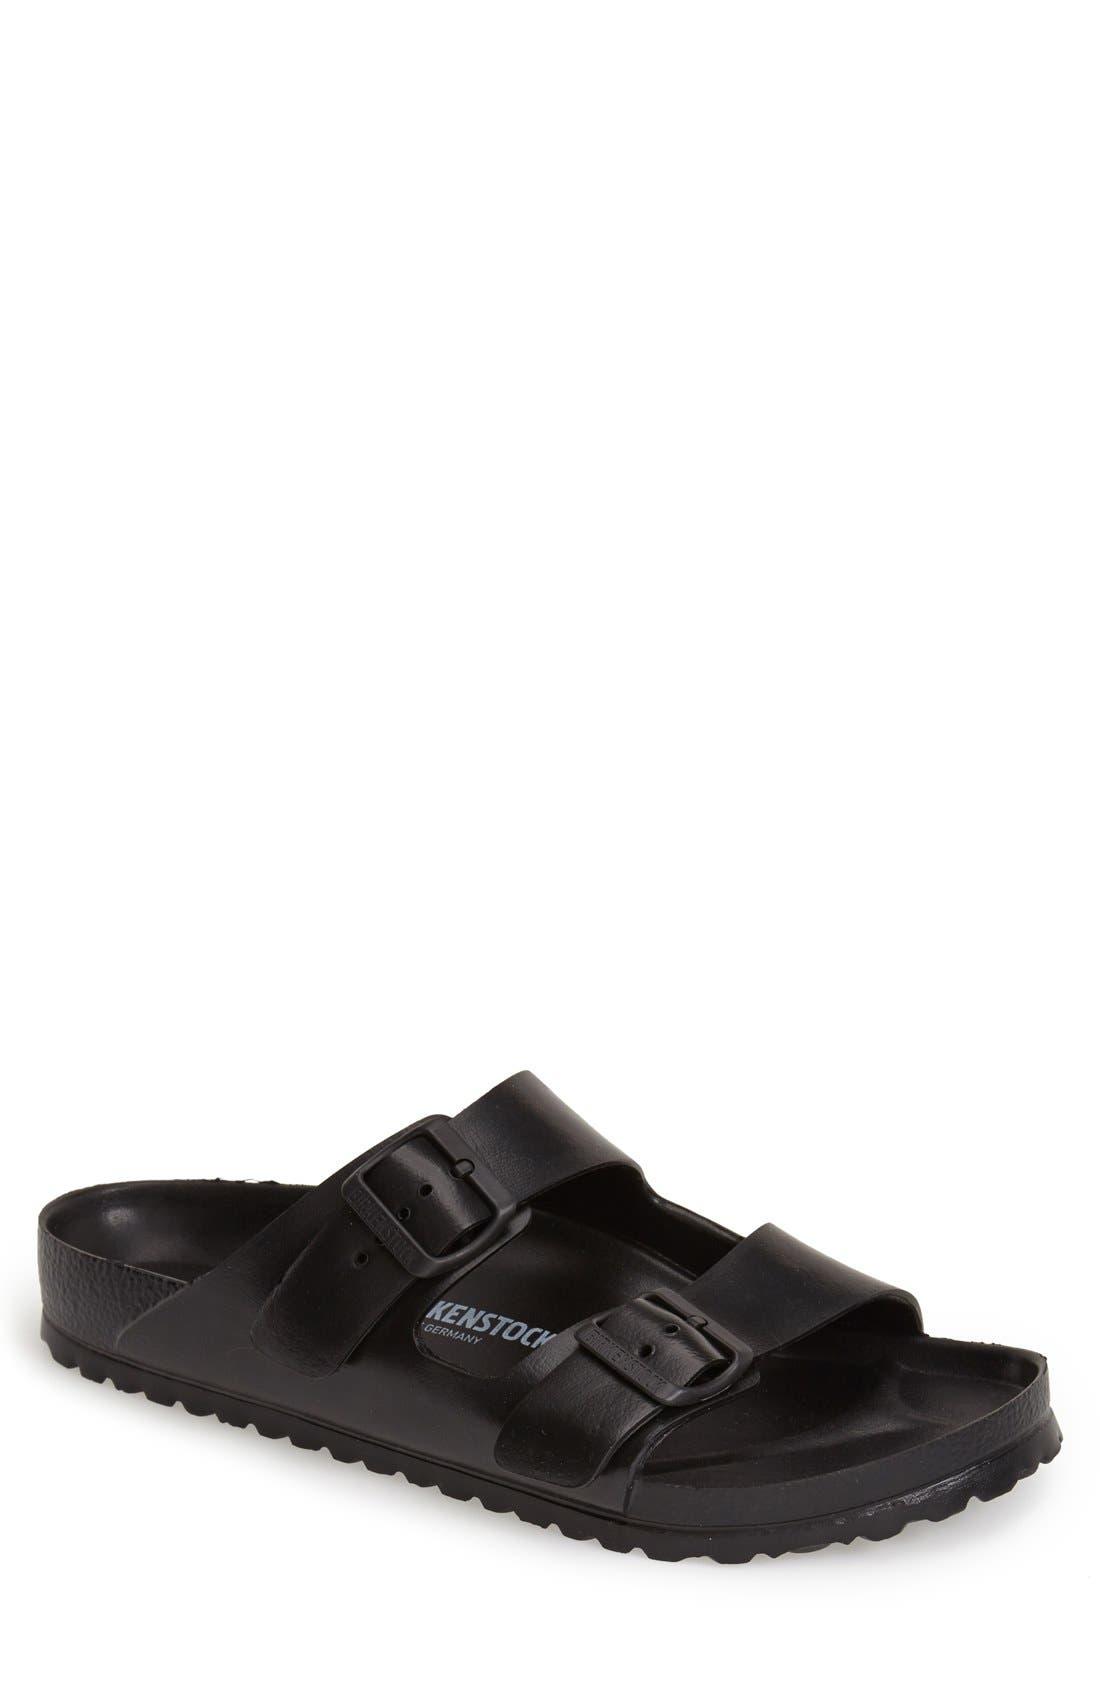 'Essentials - Arizona EVA' Waterproof Slide Sandal,                             Main thumbnail 1, color,                             BLACK